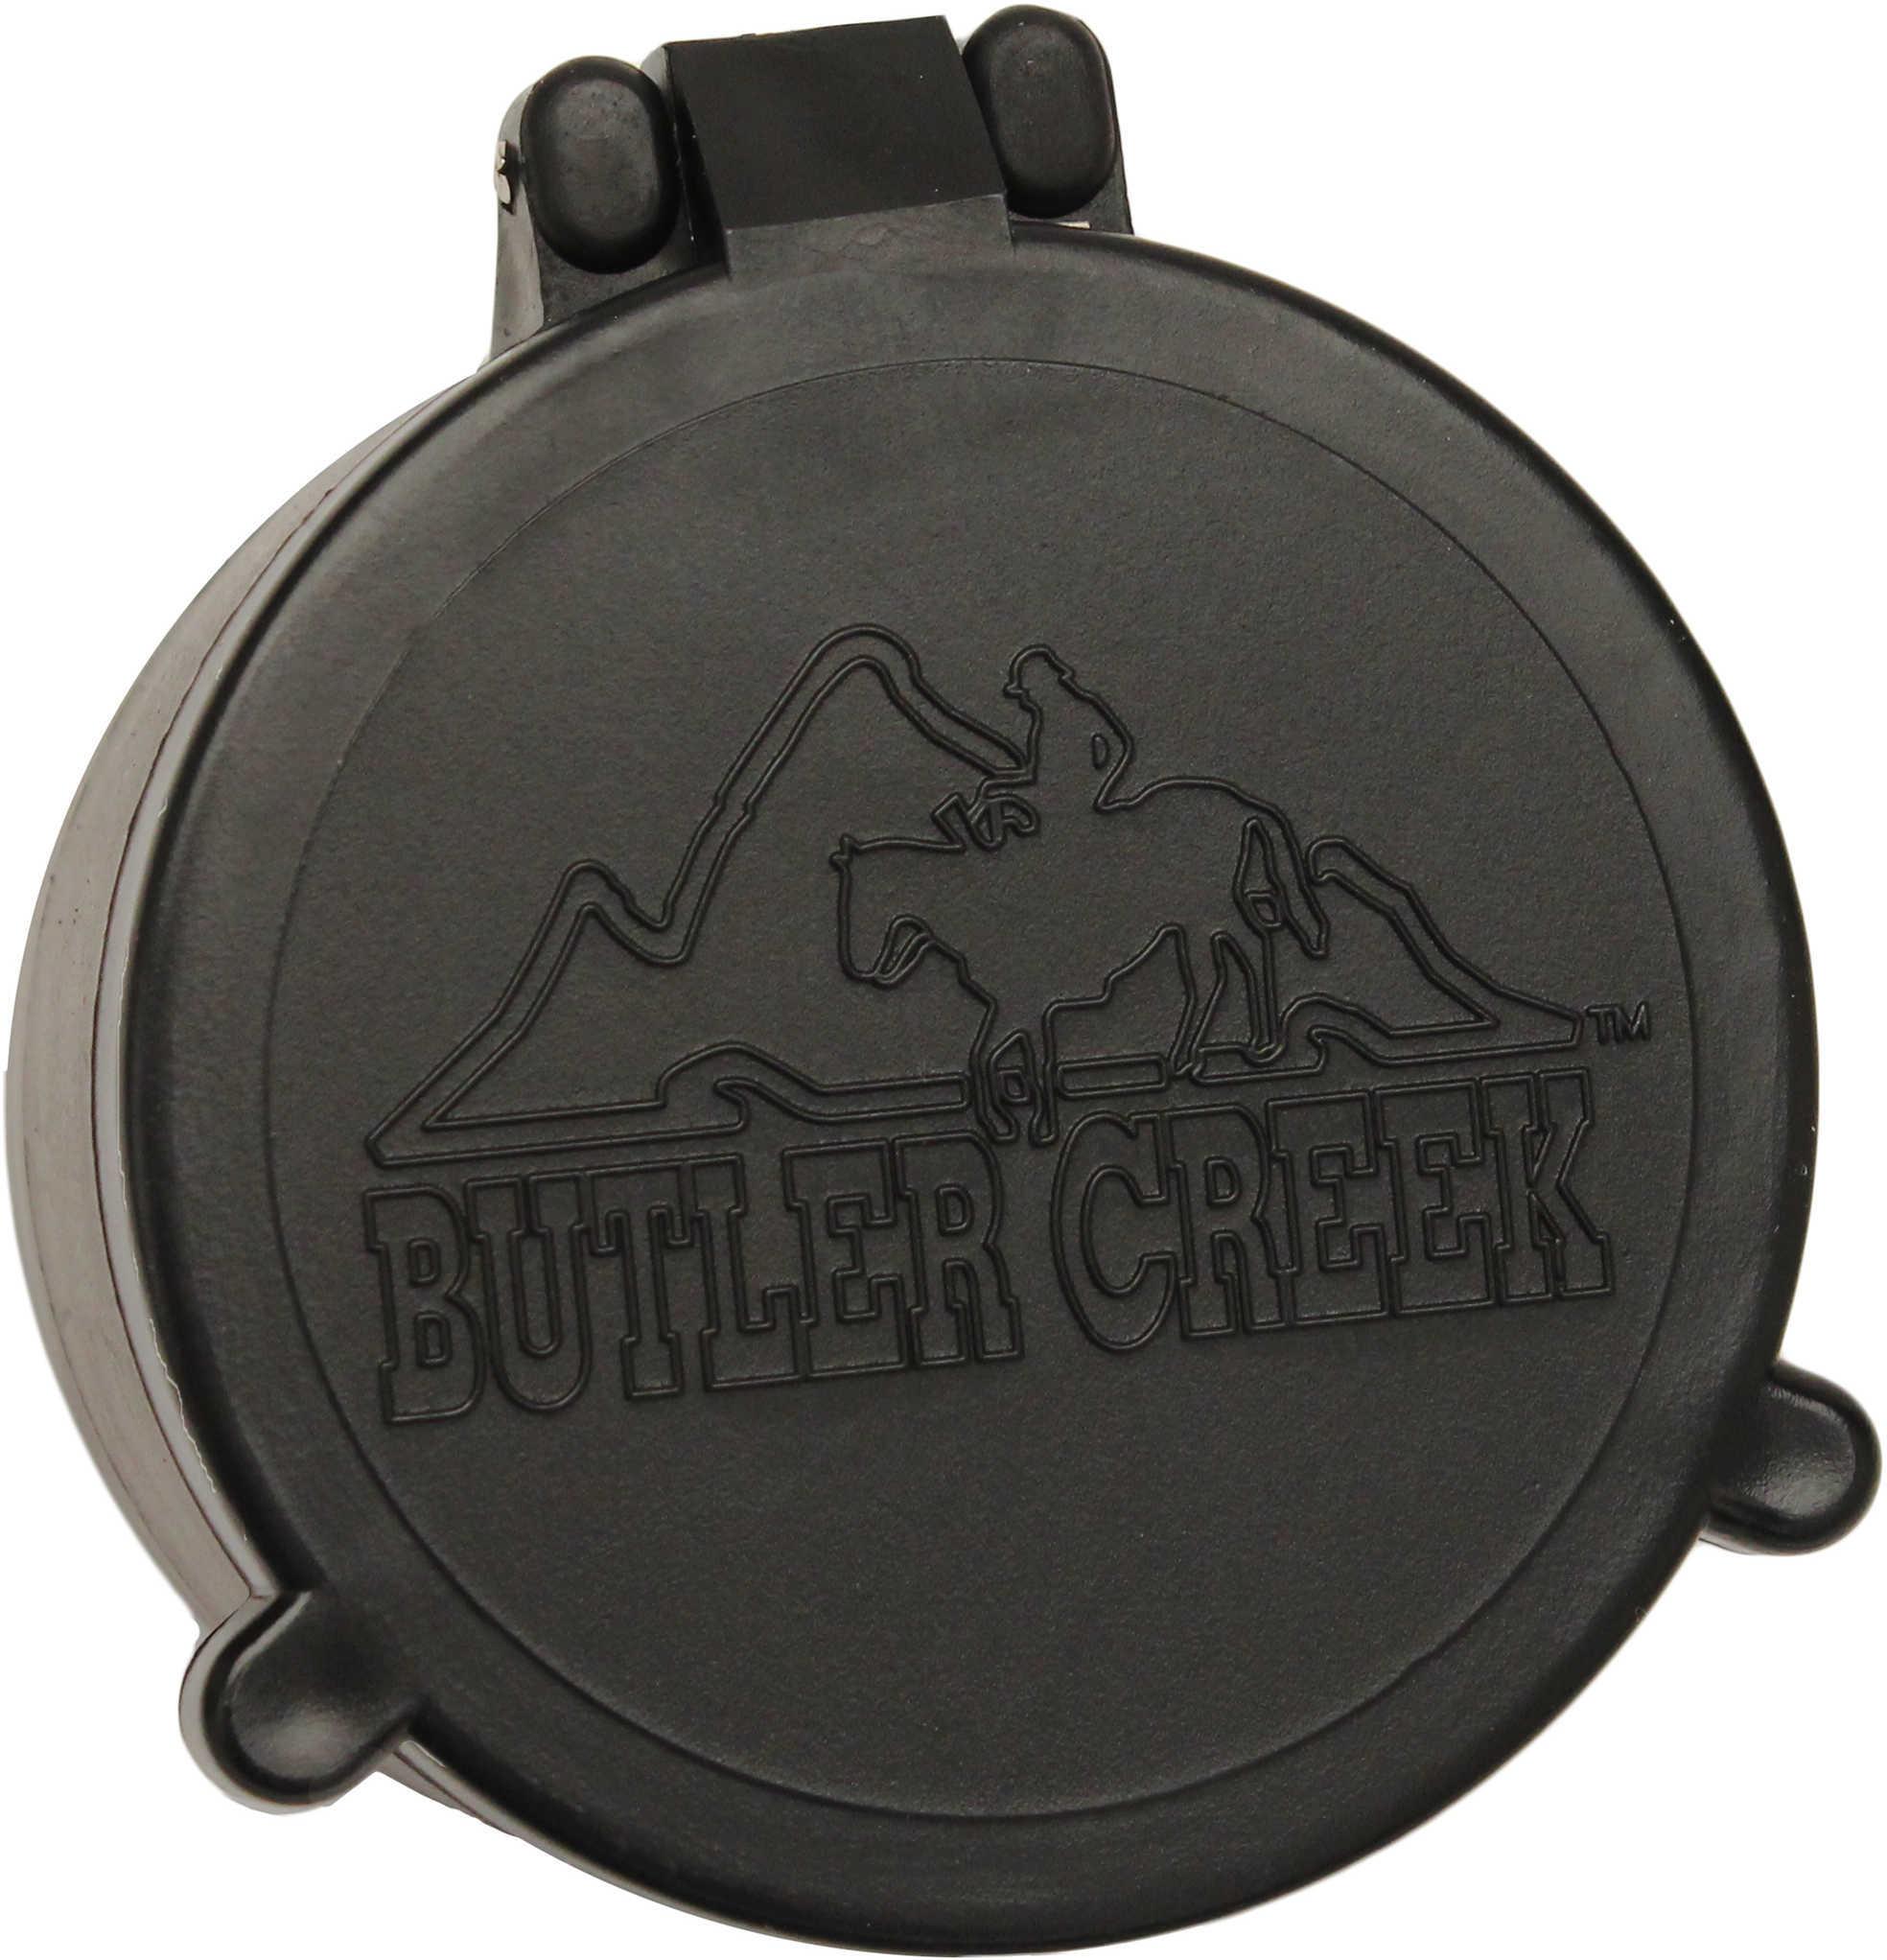 Butler Creek Flip Open Scope Cover - Objective Size 29 Md: 30290